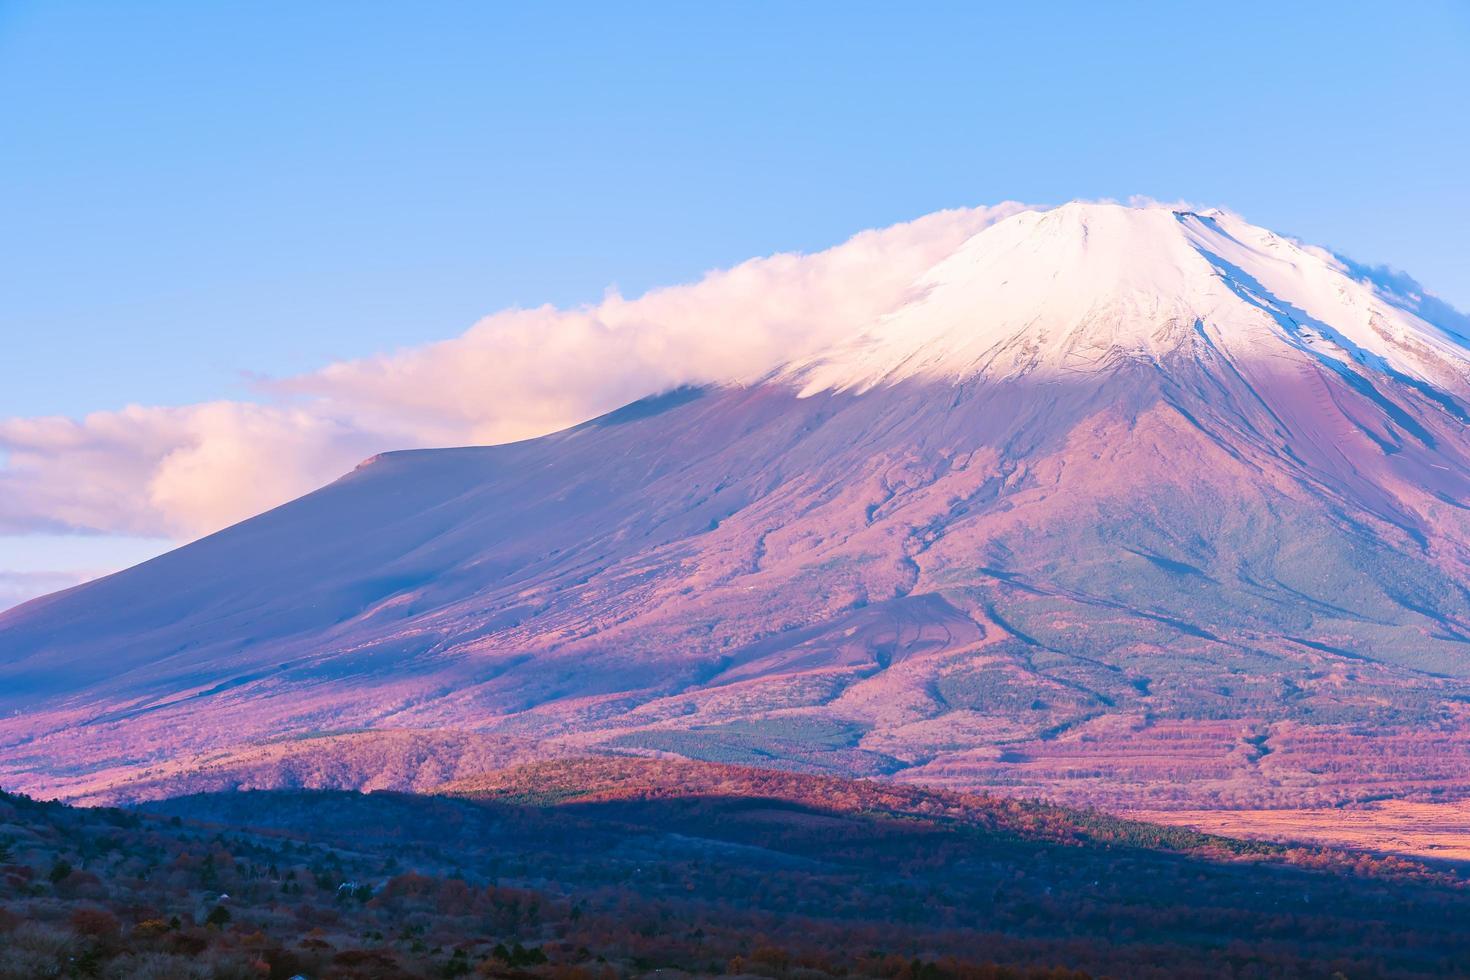 beau mt. Fuji au lac Yamanaka, Japon photo